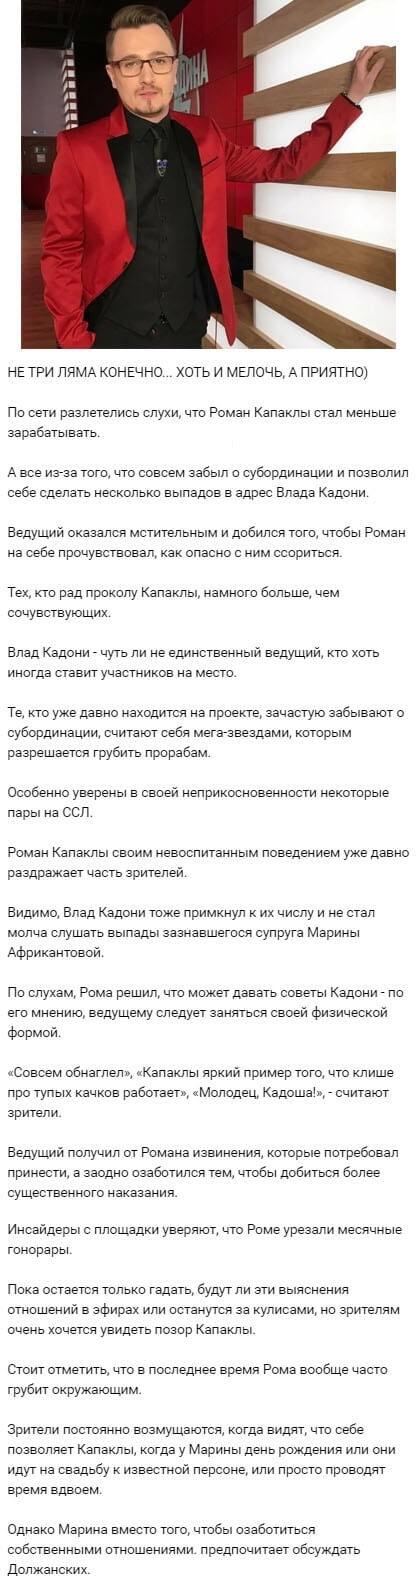 Влад Кадони при помощи связей наказал дерзкого Романа Капаклы